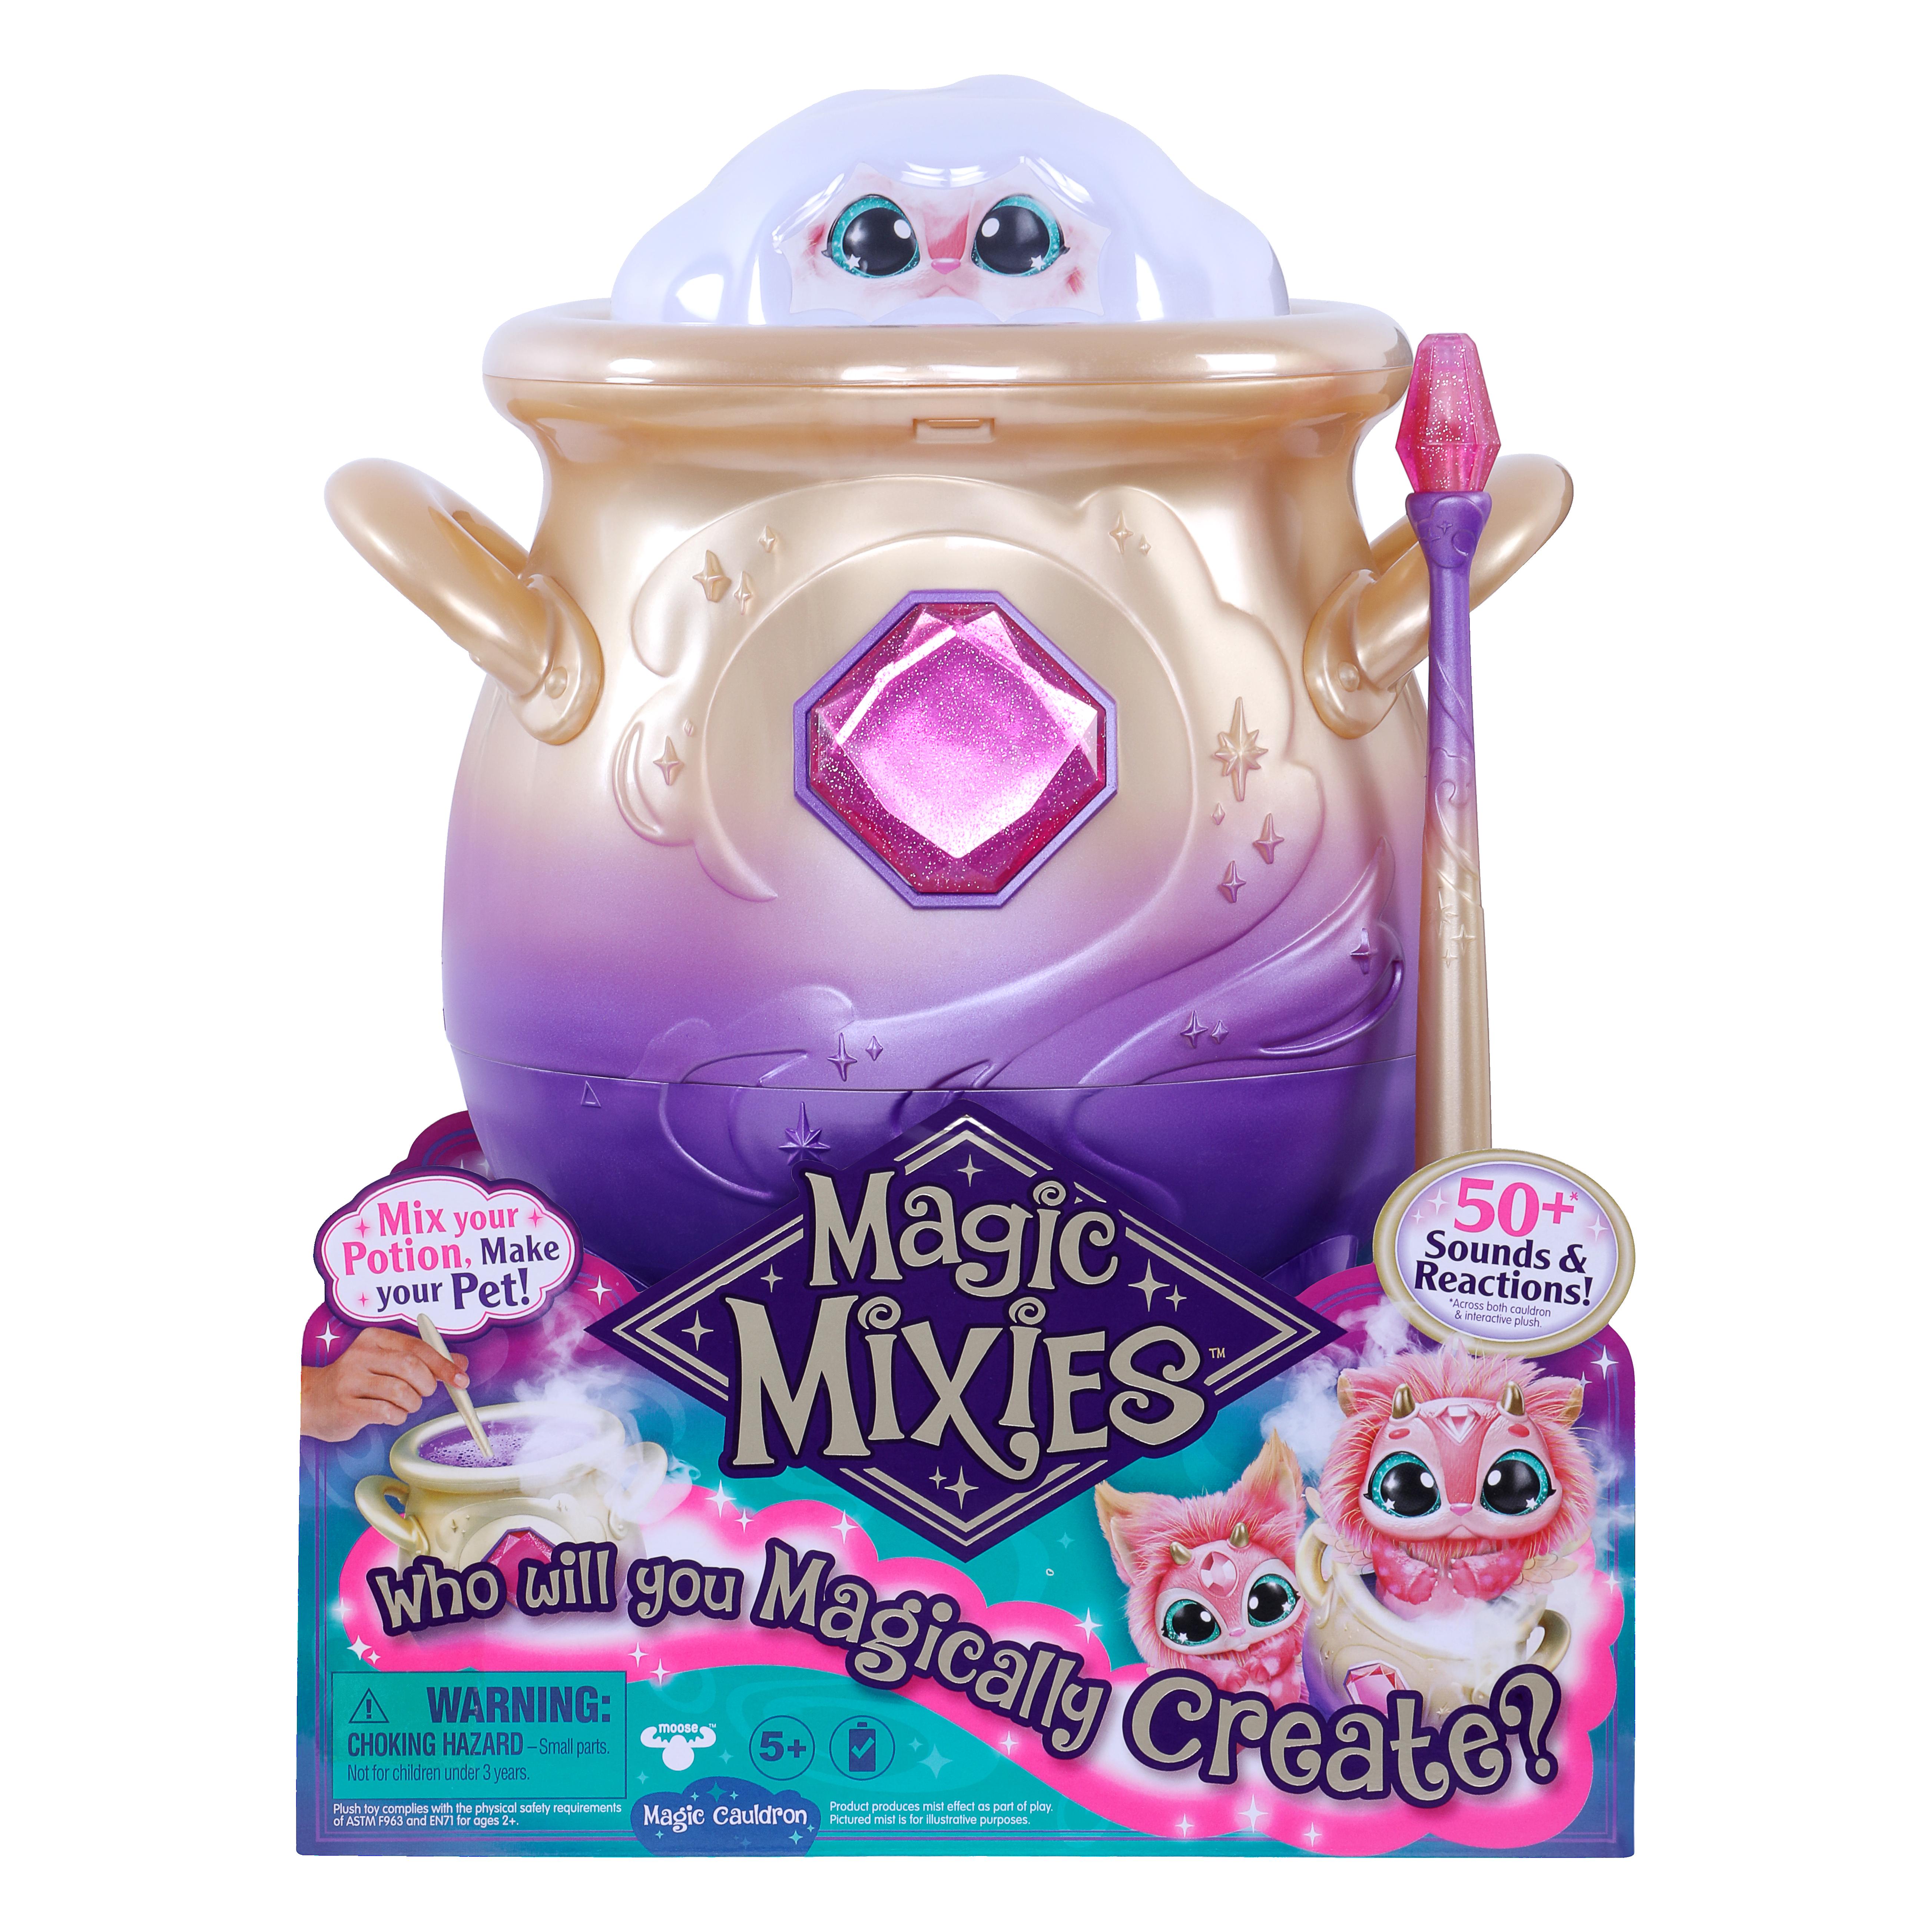 Magic Mixies Magic Cauldron